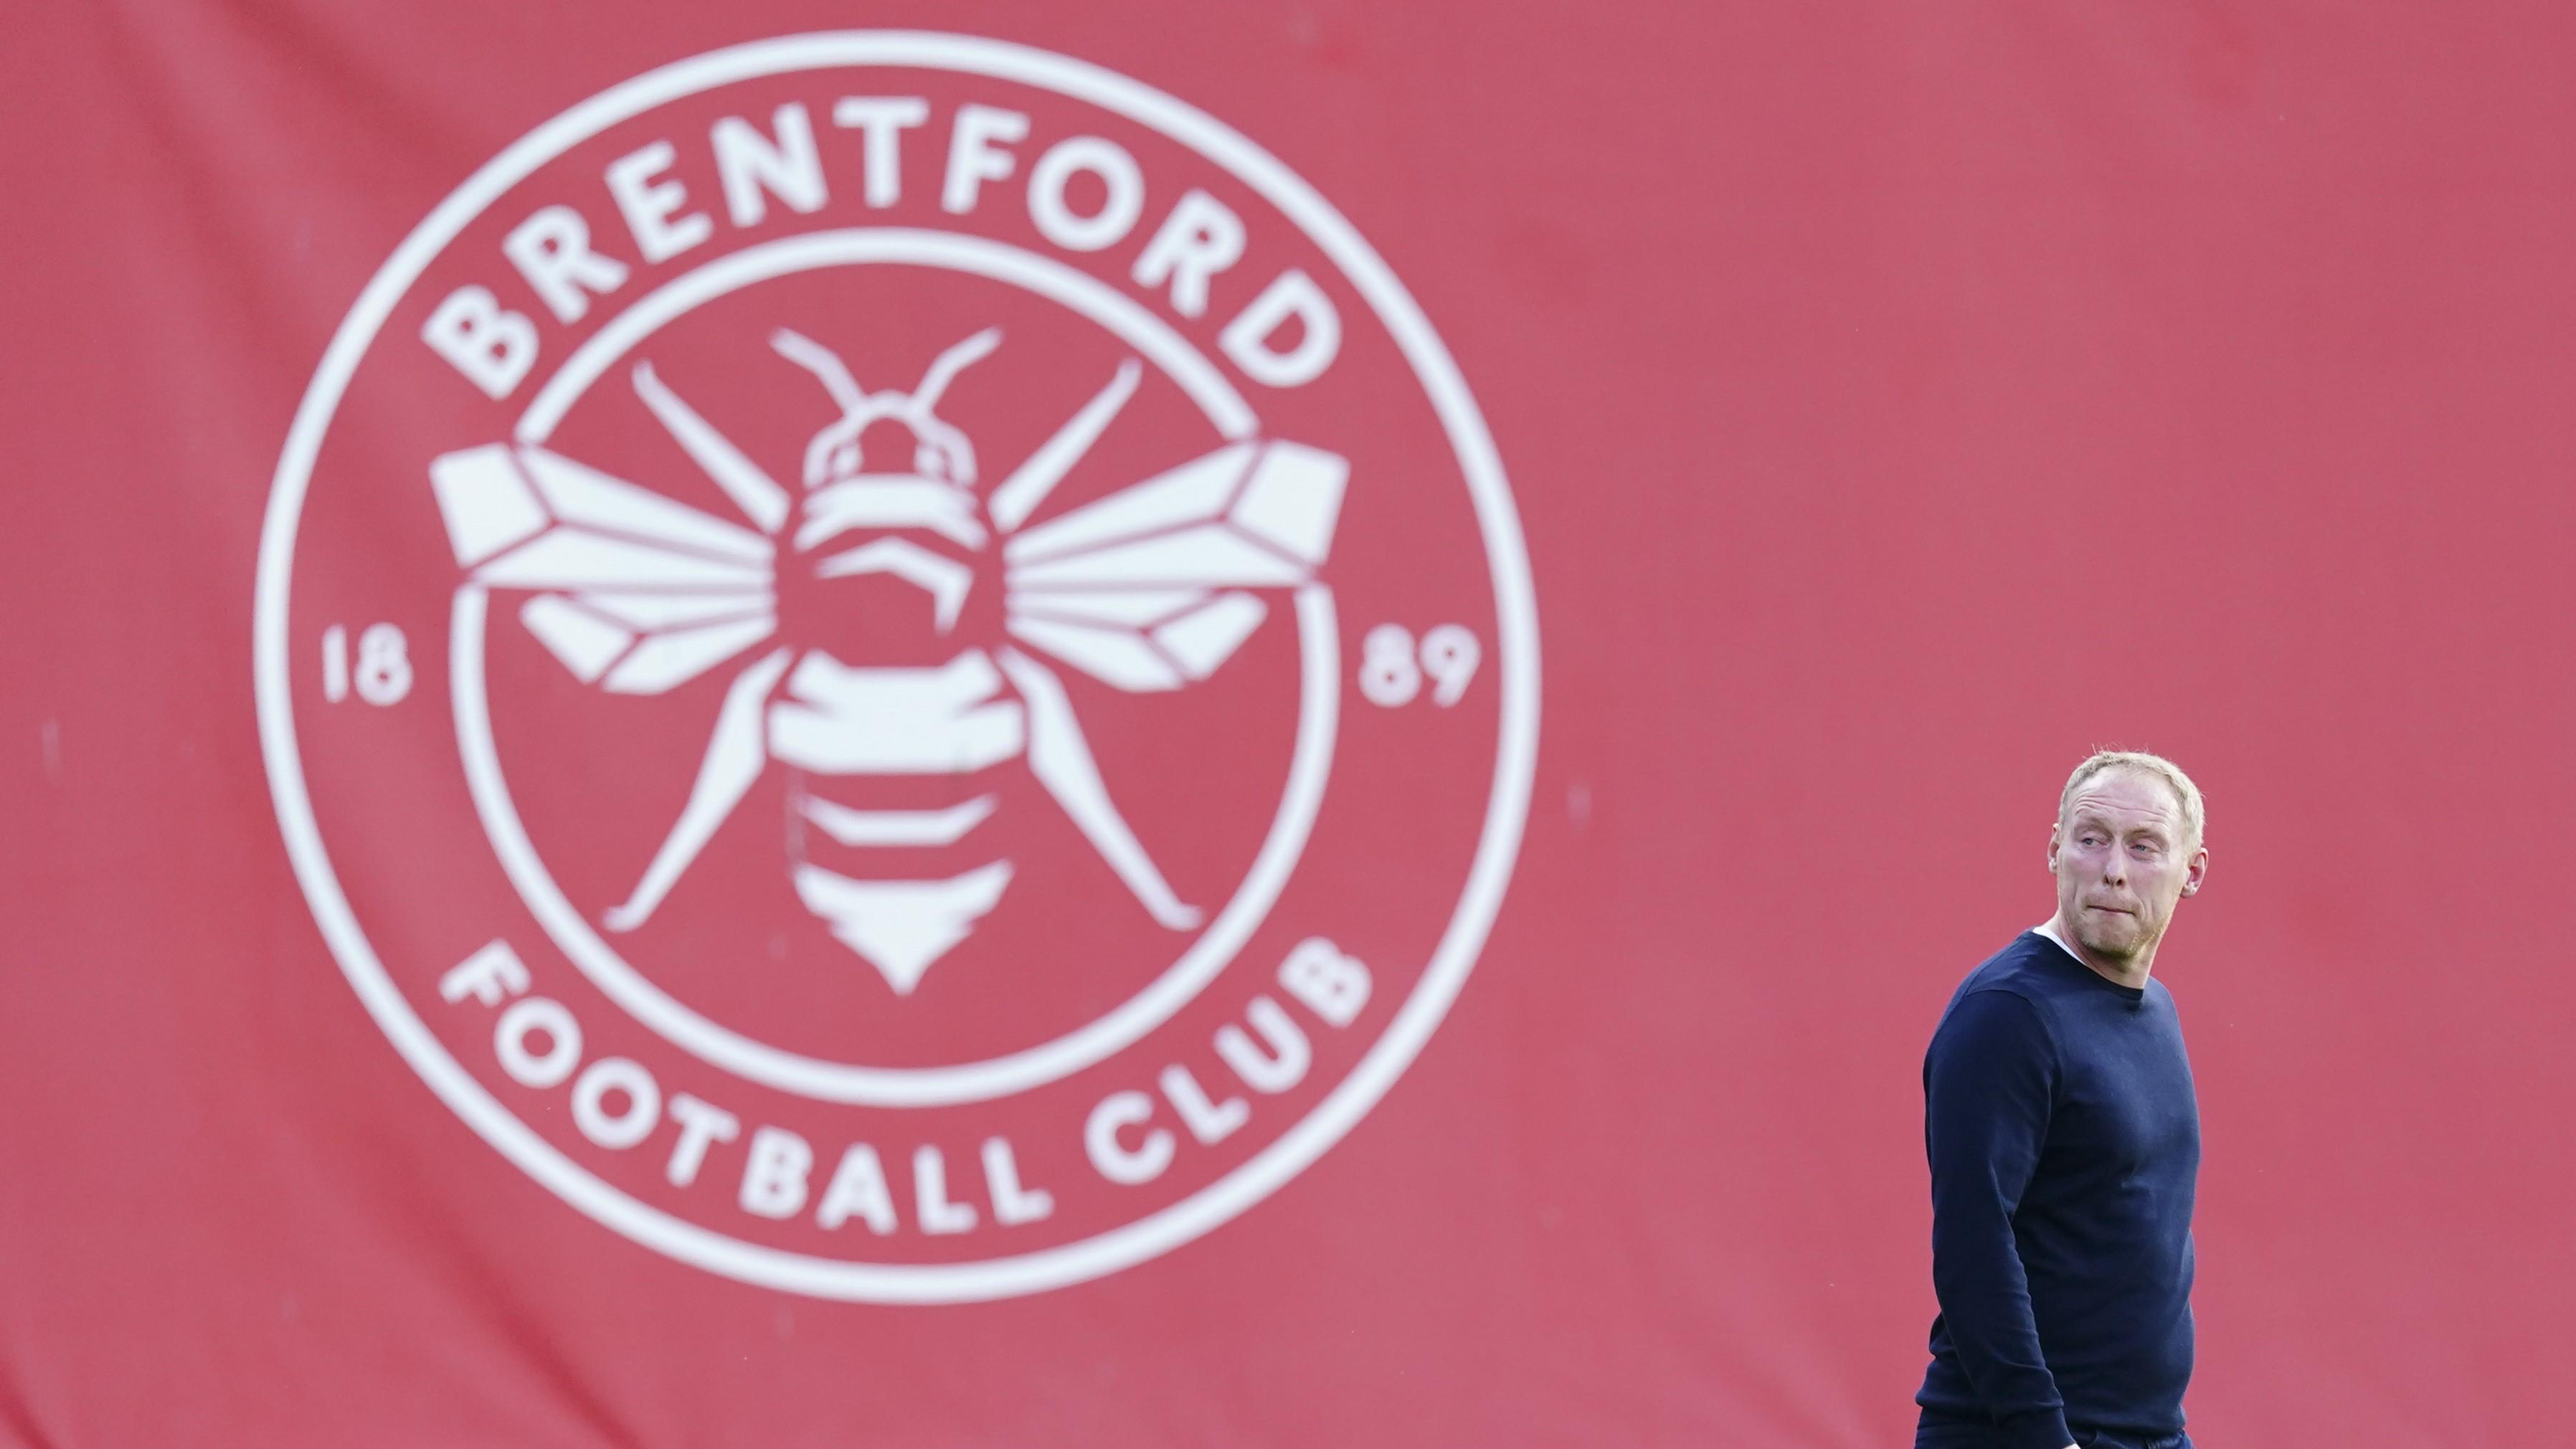 Brentford v Swansea City